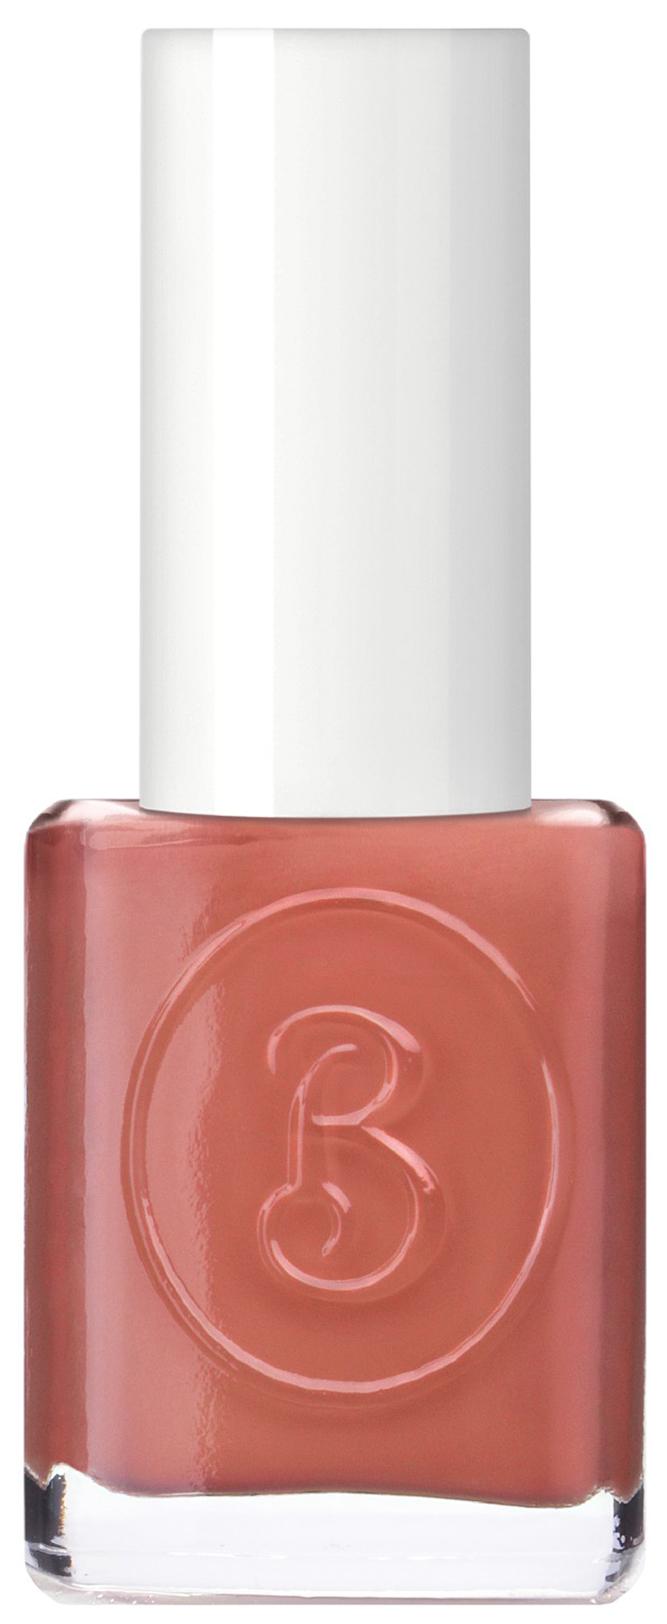 Лак для ногтей Berenice Oxygen Nail Lacquer 04 Harmony 15 мл по цене 415